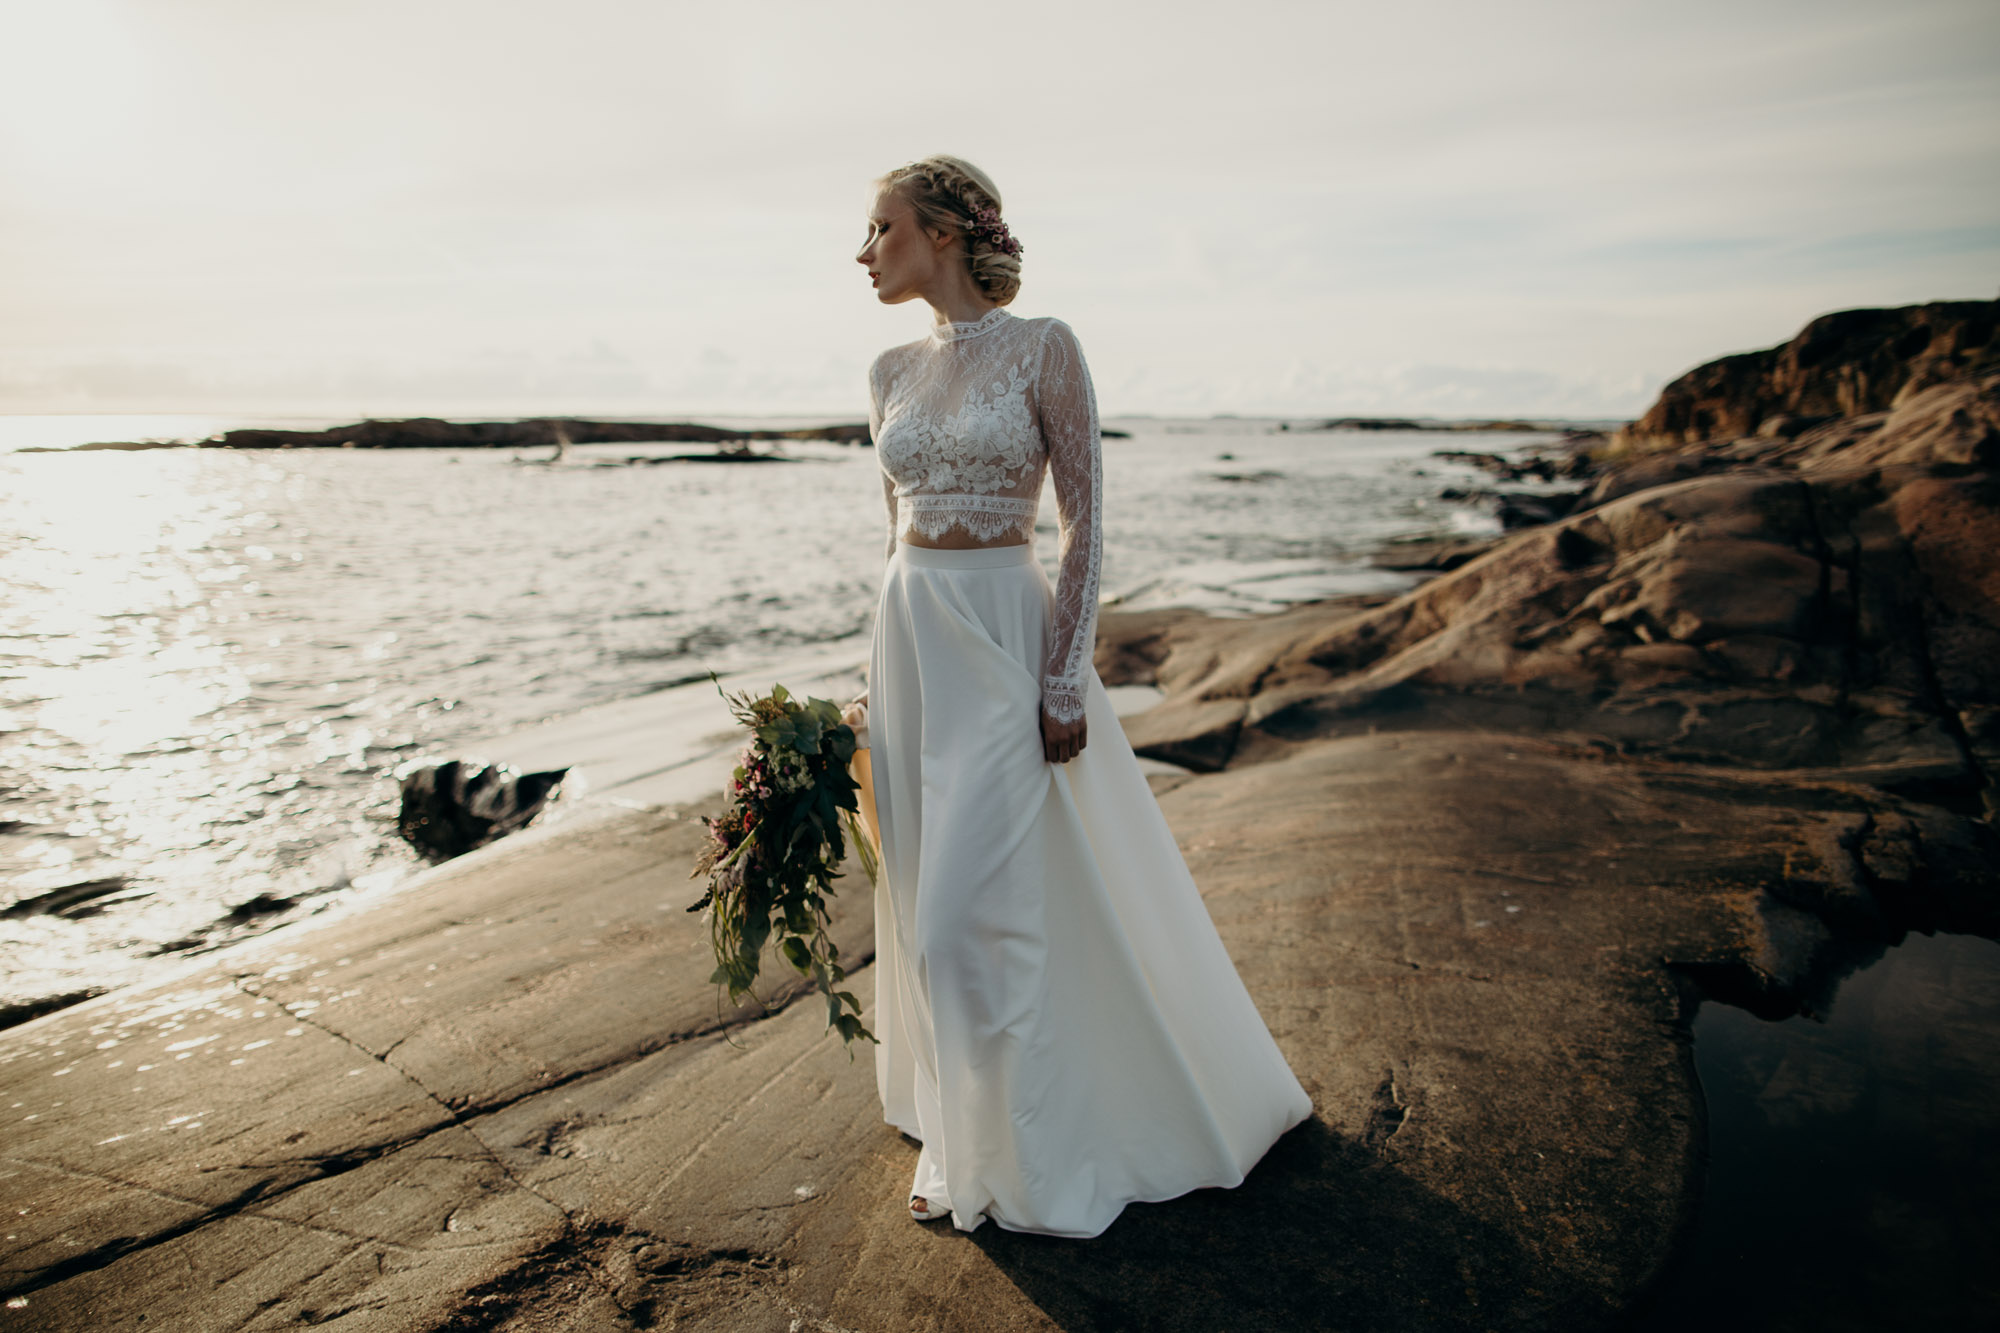 oro_weddings-jere_satamo-382.jpg